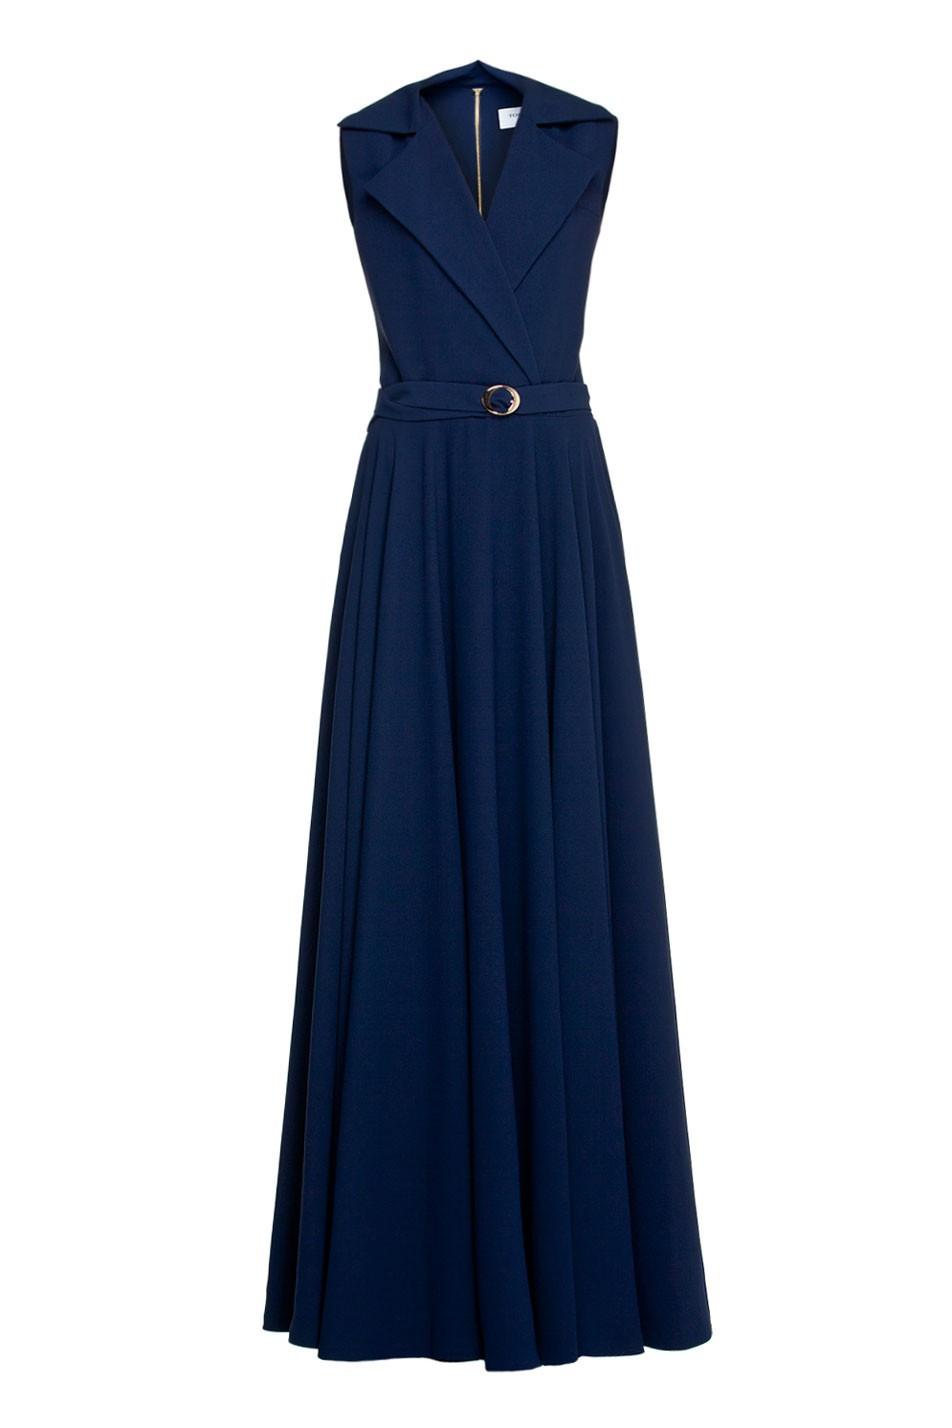 maxi dress with belt tomaotomo